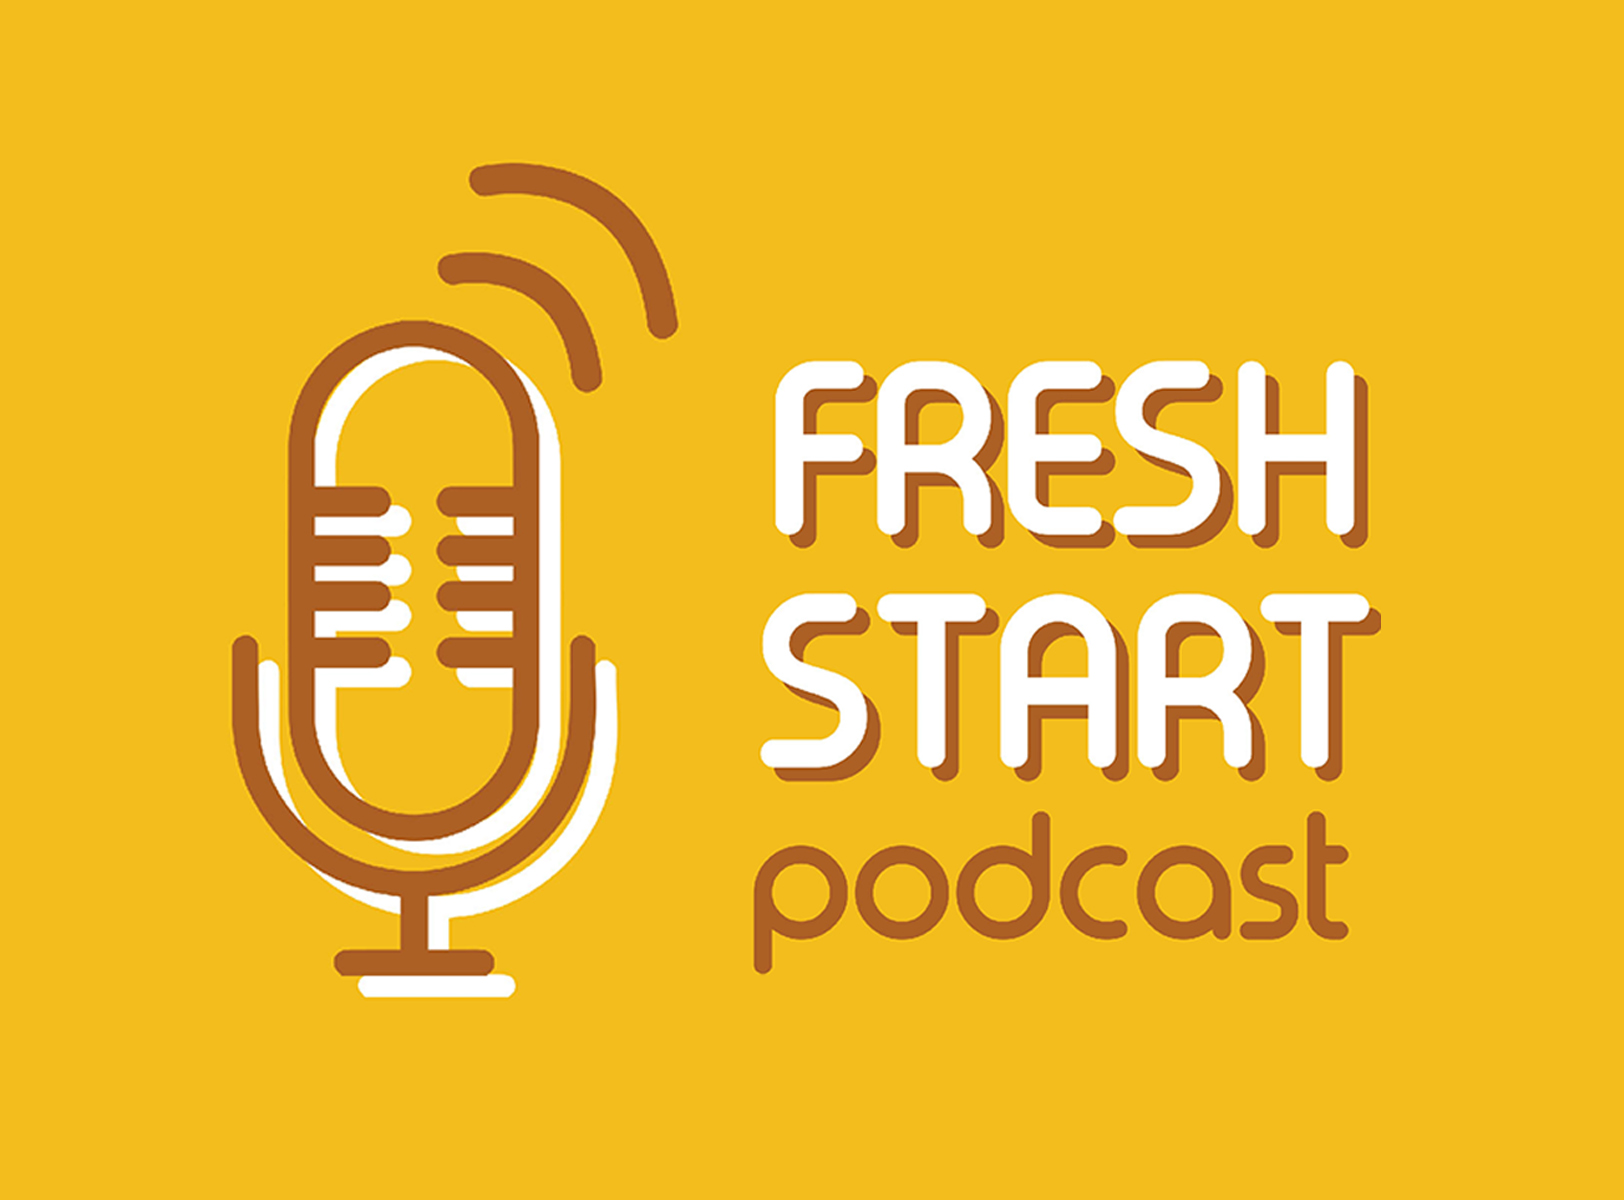 Fresh Start: Podcast News (4/8/2019 Mon.)